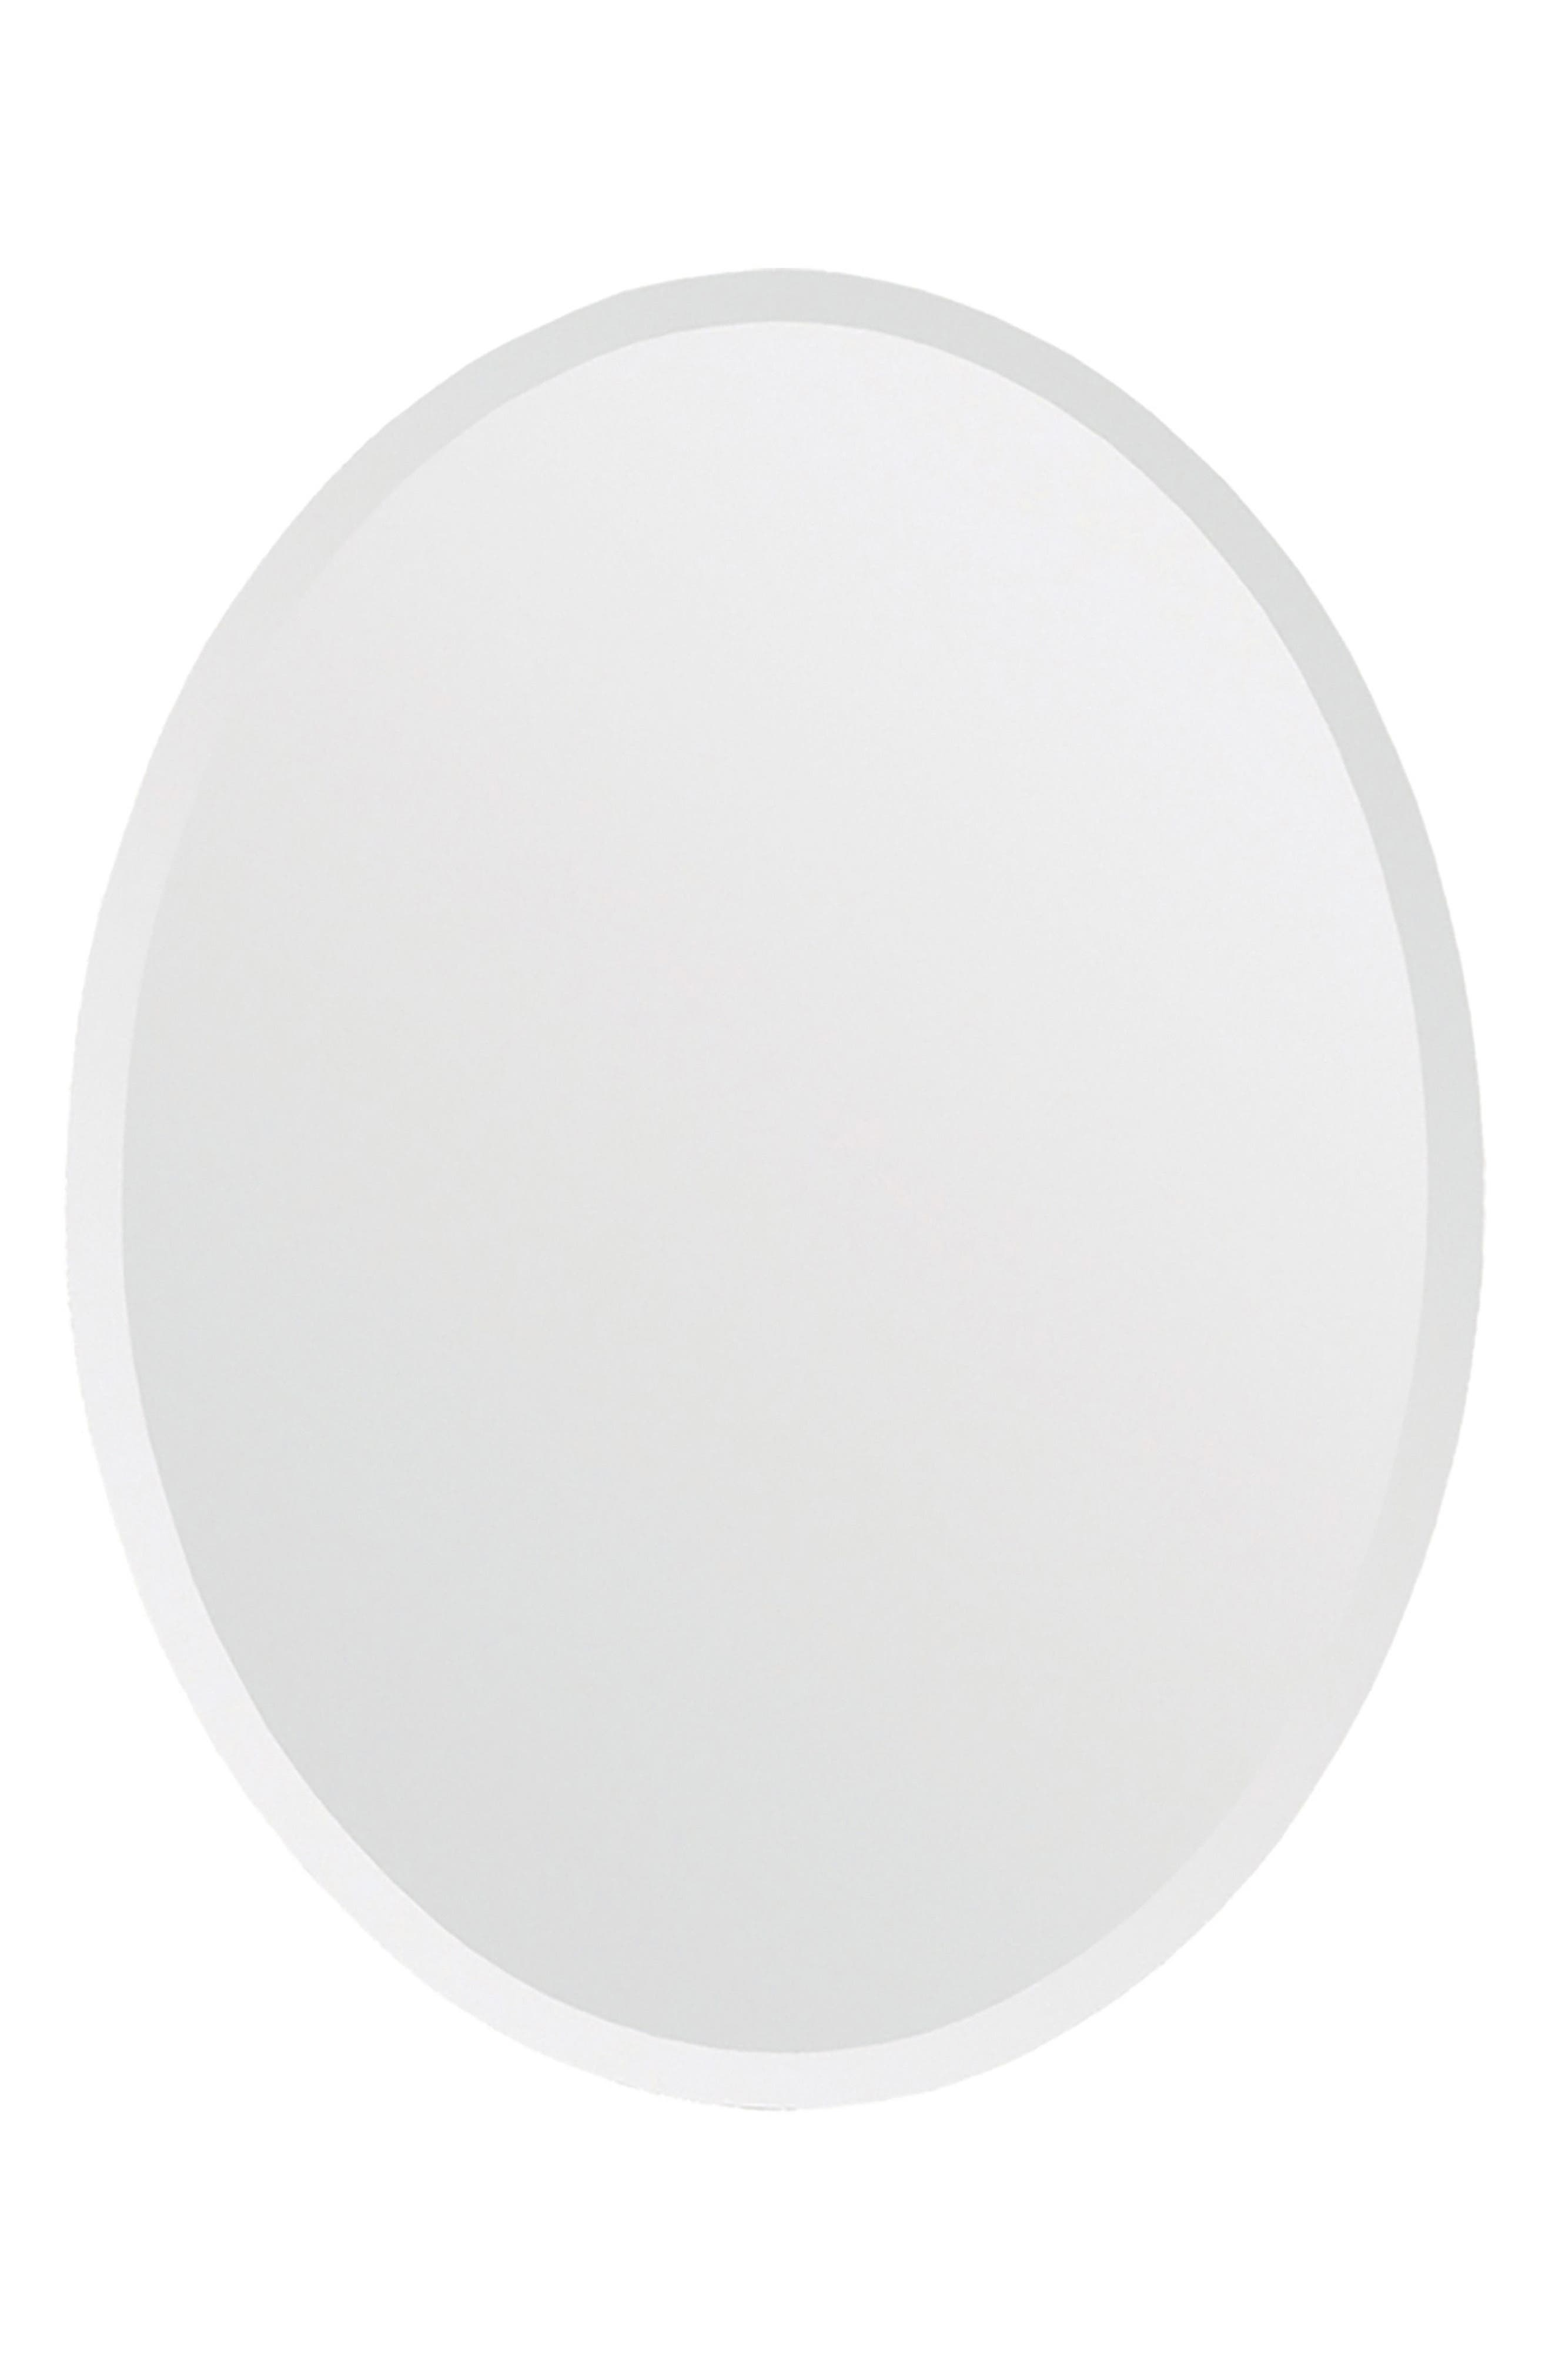 Zsa Zsa Oval Mirror,                             Main thumbnail 1, color,                             100